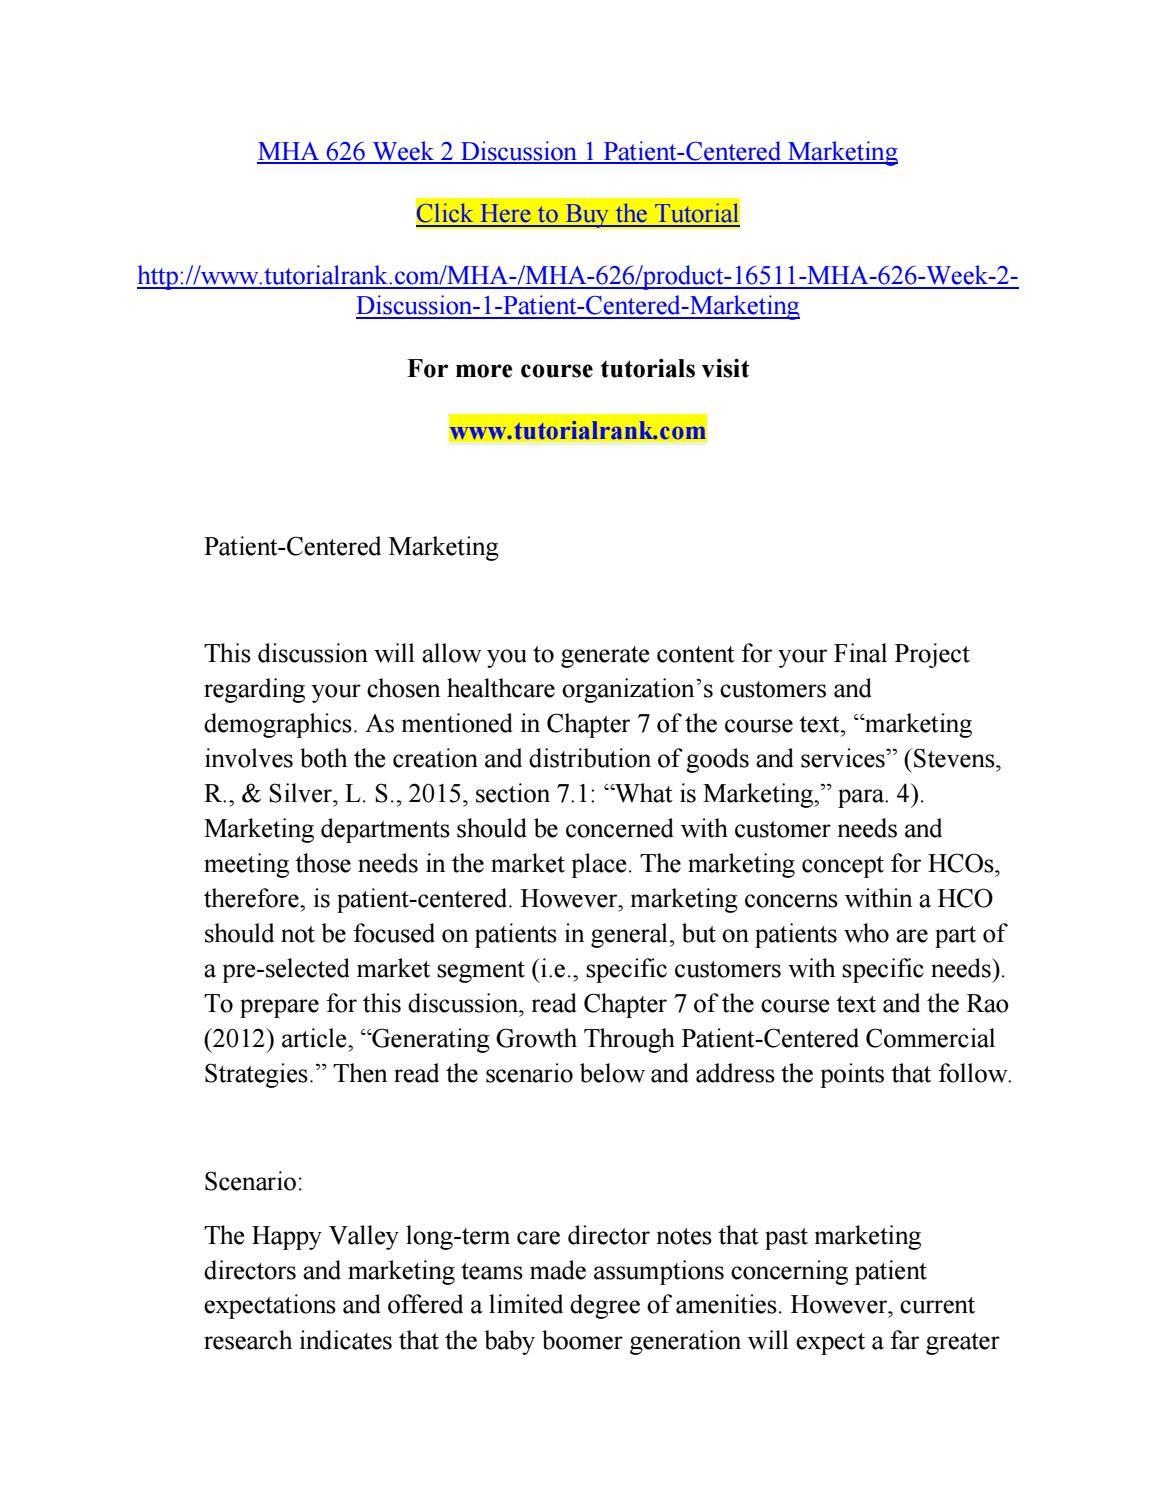 Marketing plan mha 626